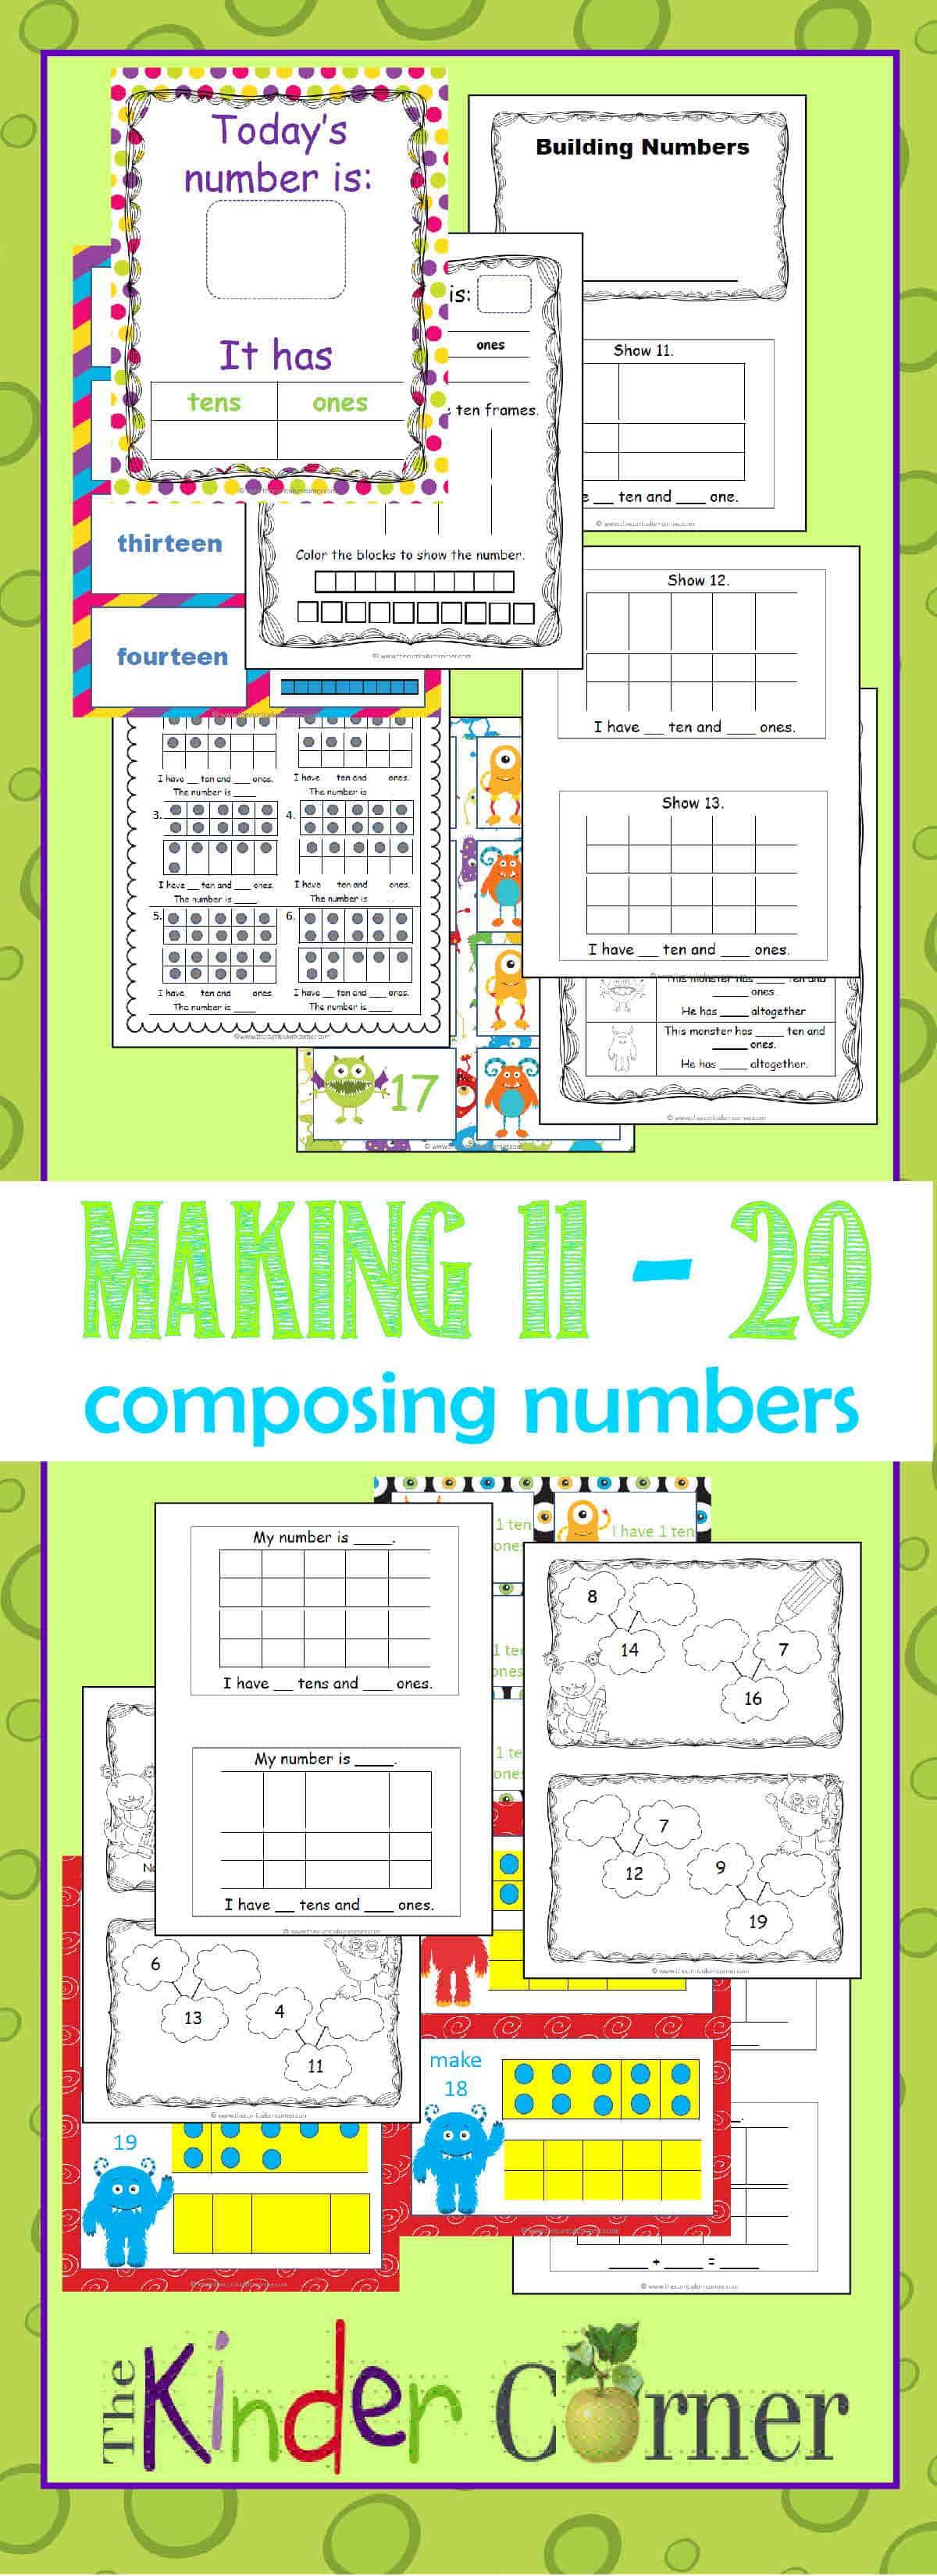 Composing & Decomposing (11-20)